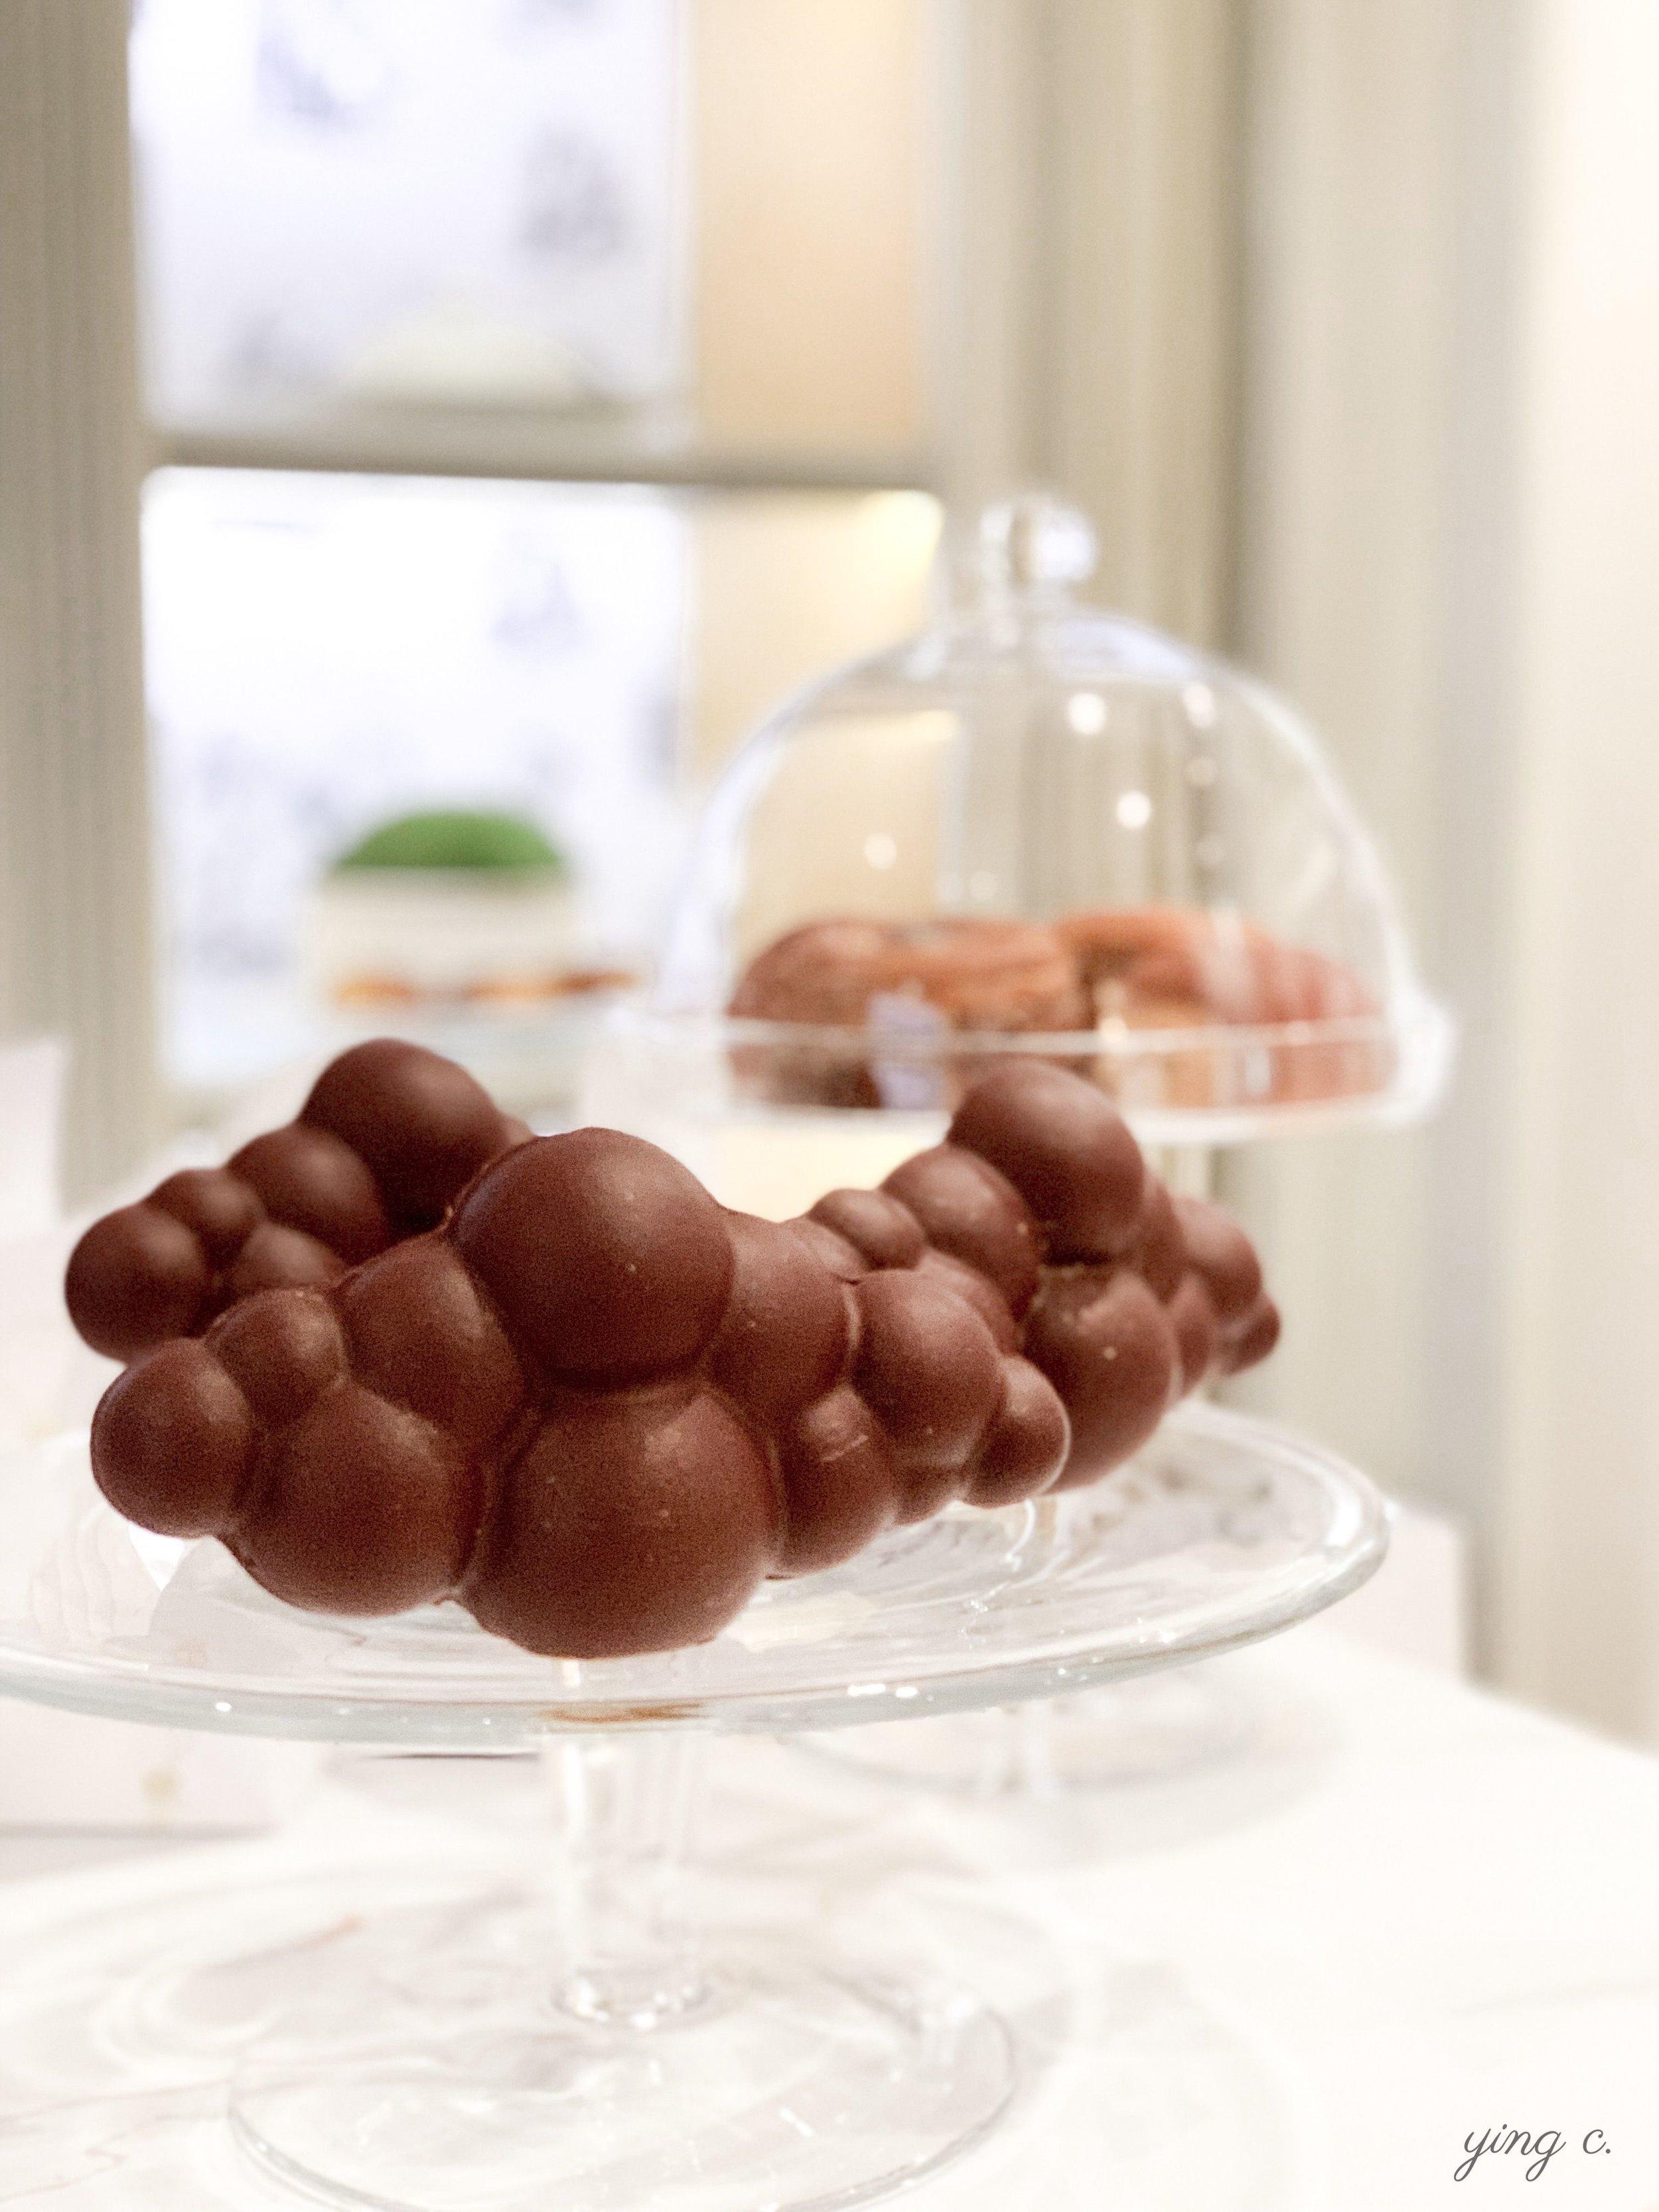 la tablette nuage / 雲型巧克力塊